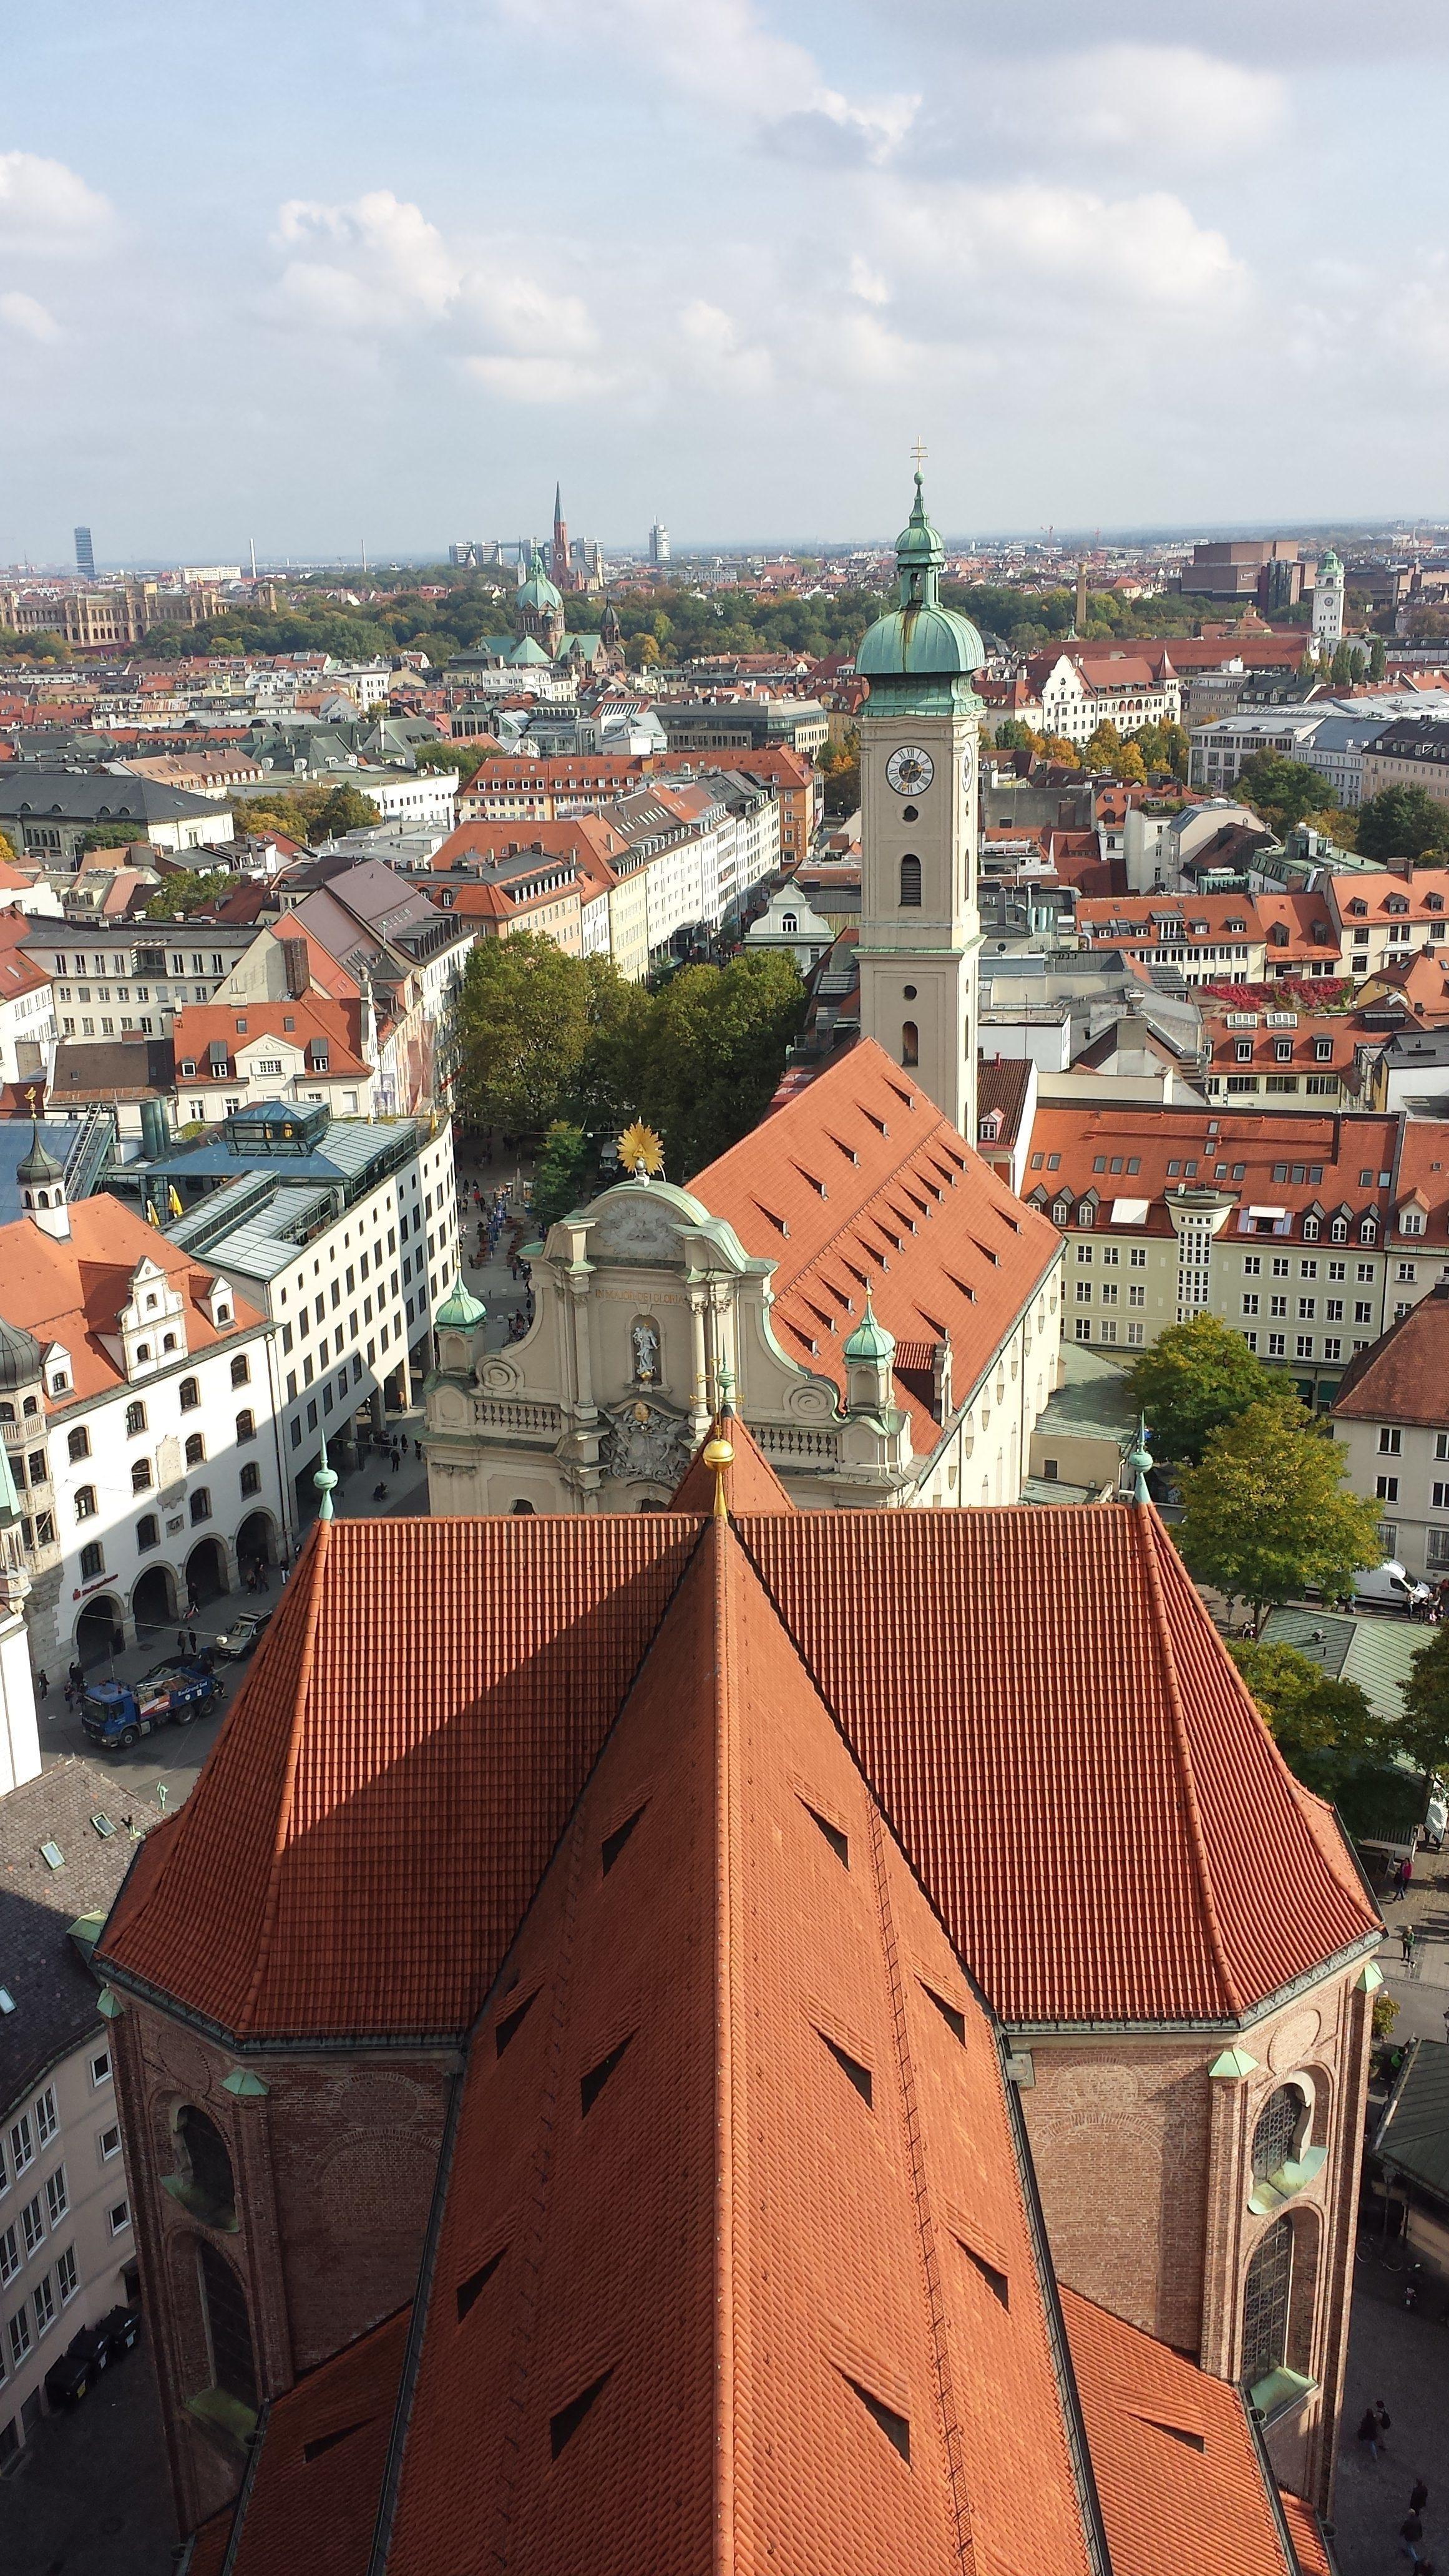 St. Peterskirche views